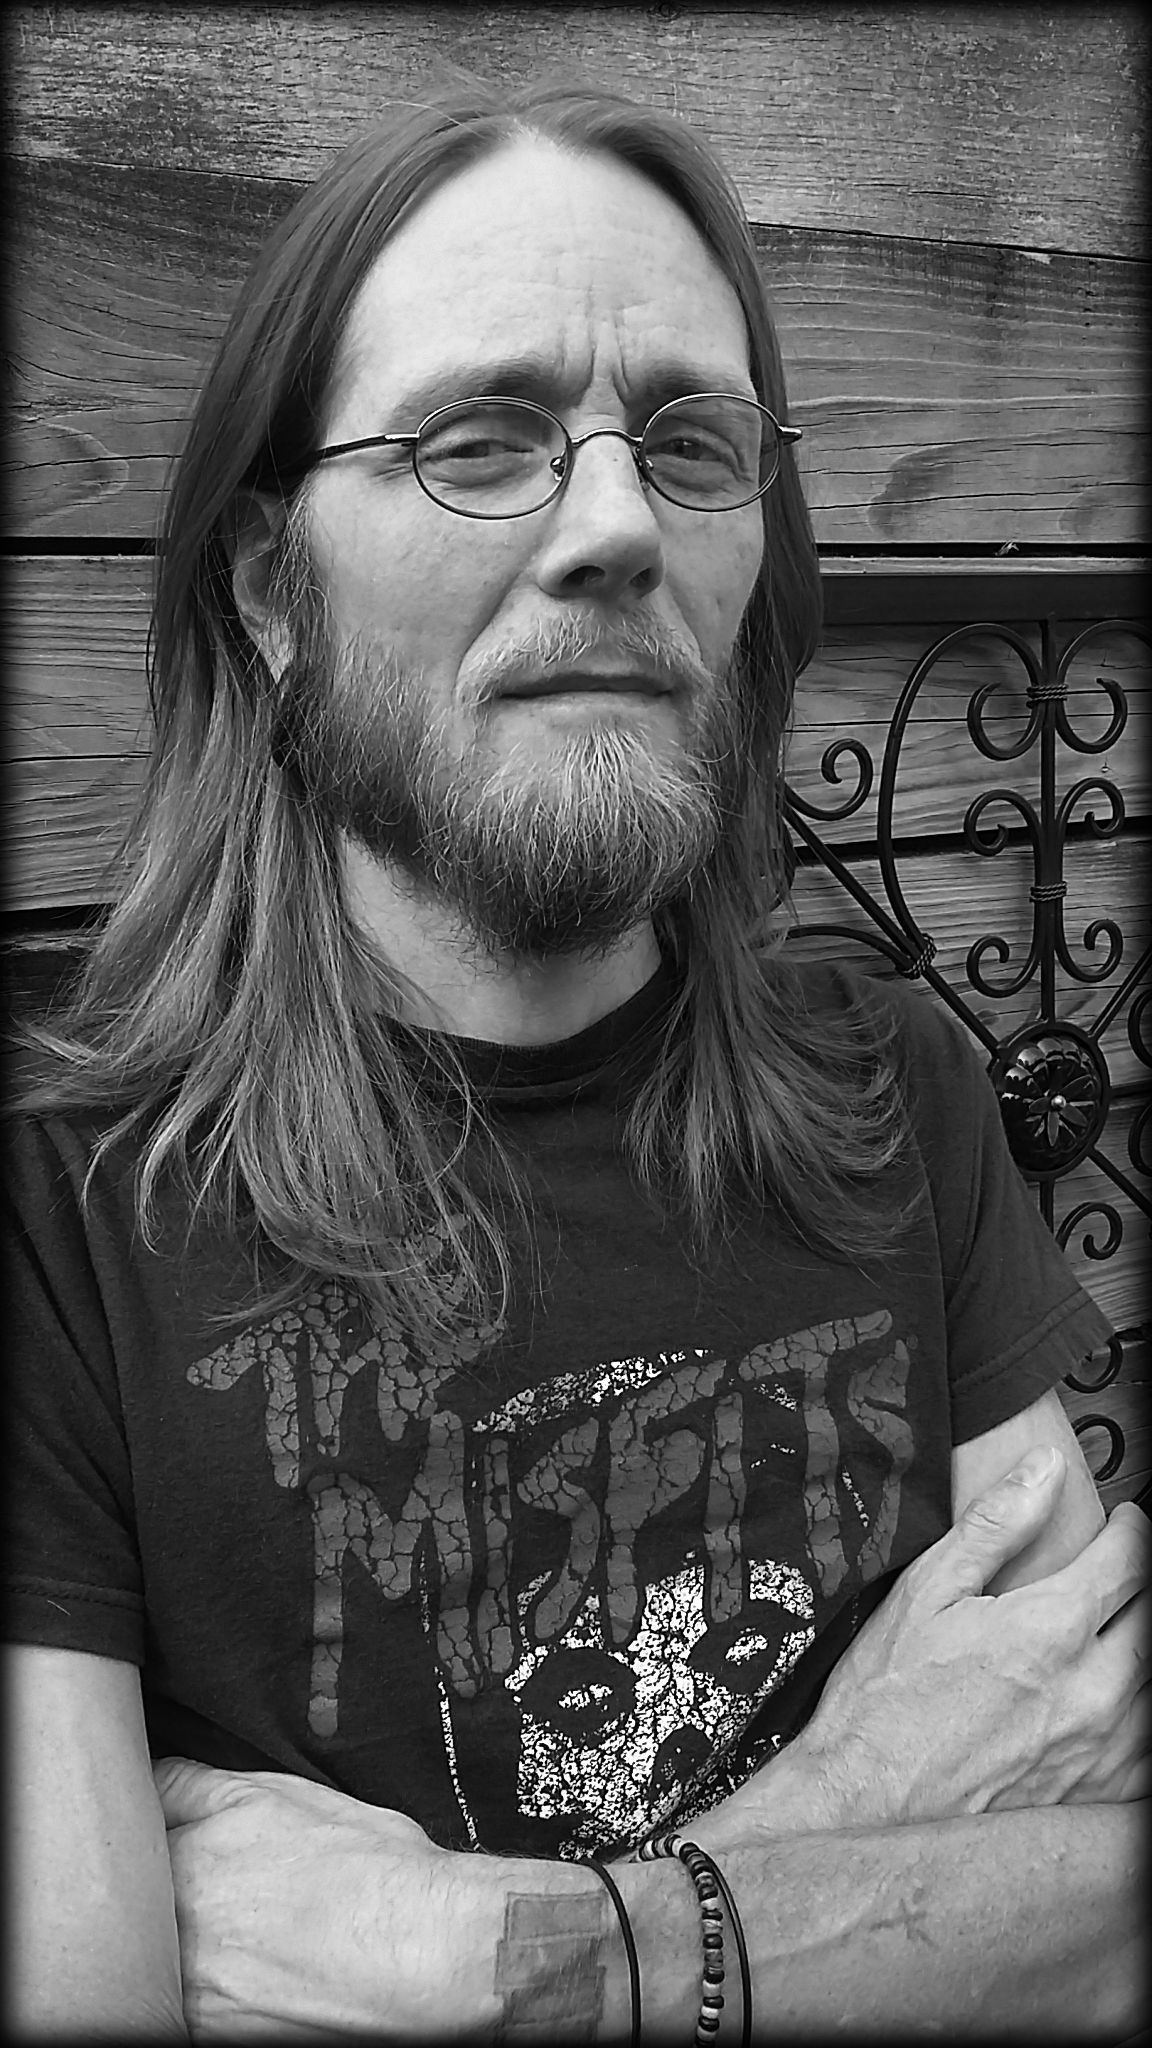 Chad Lutzke